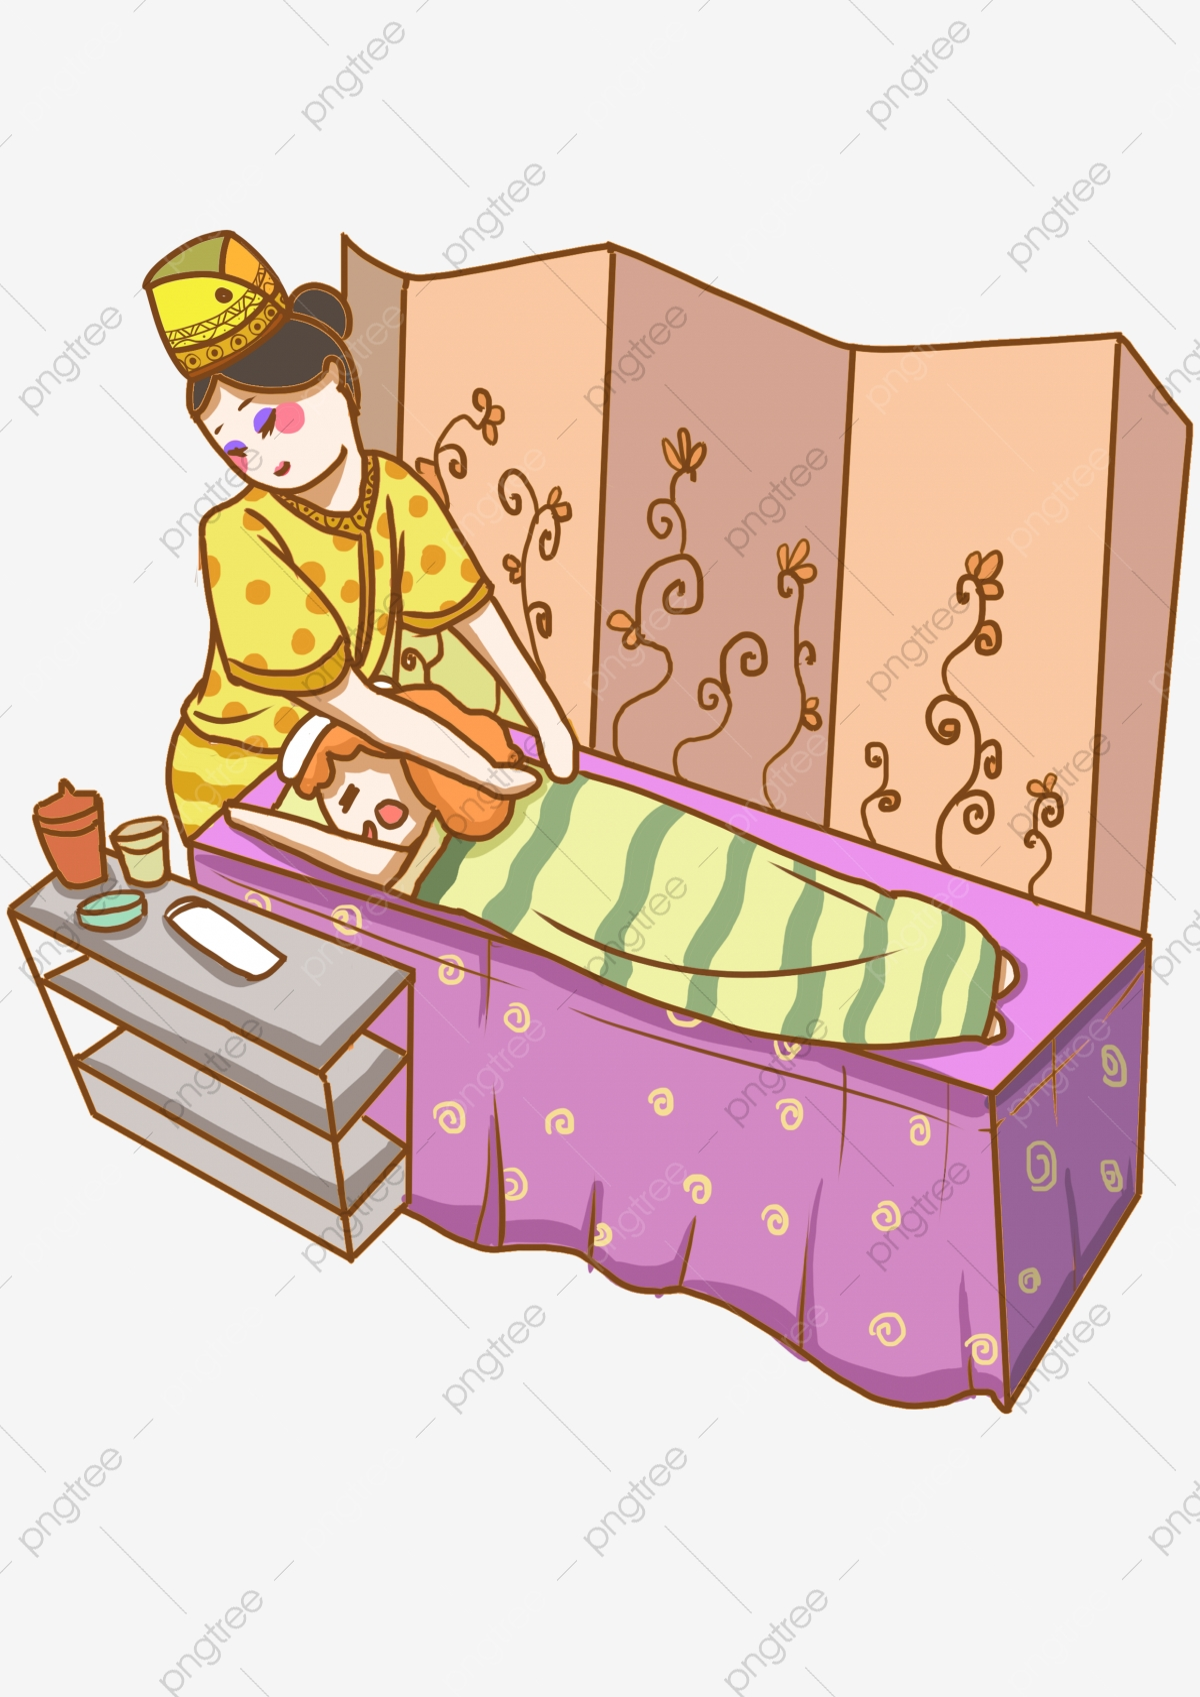 Mao Desenhado Menina Ilustracao Bela Esteticista Para Menina